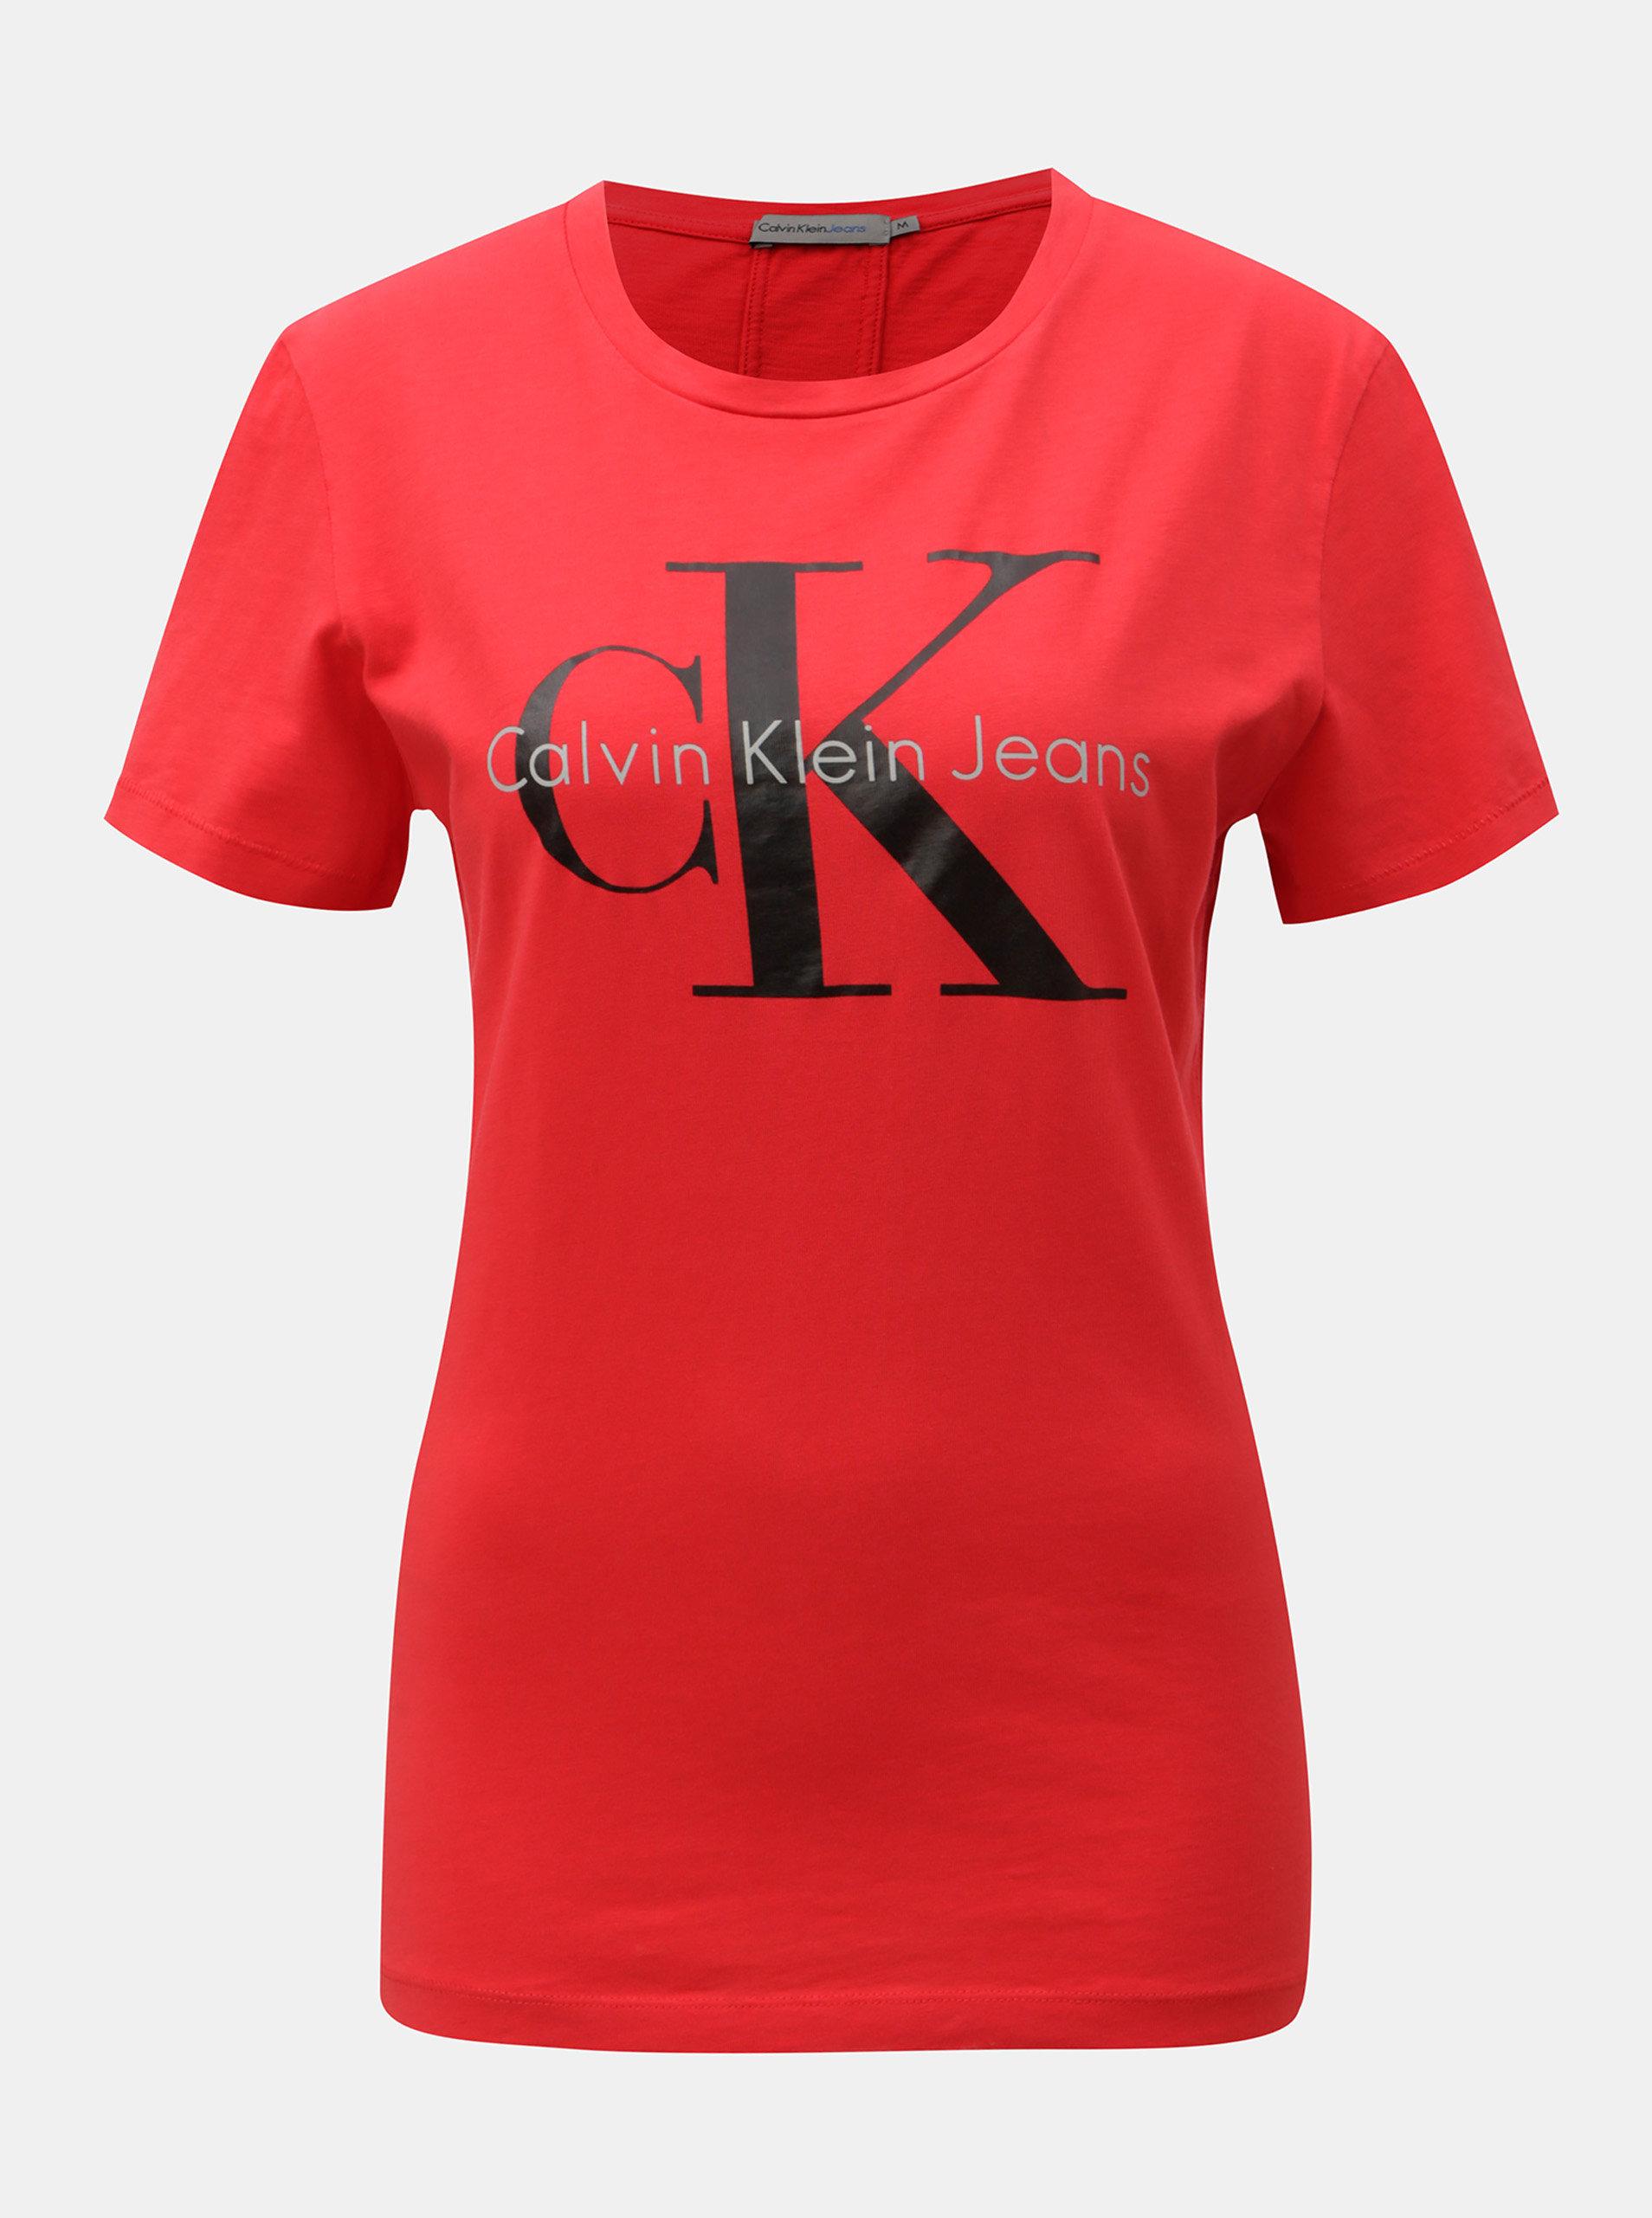 8ec9f2c2c3fa Červené dámské tričko s potiskem Calvin Klein Jeans ...